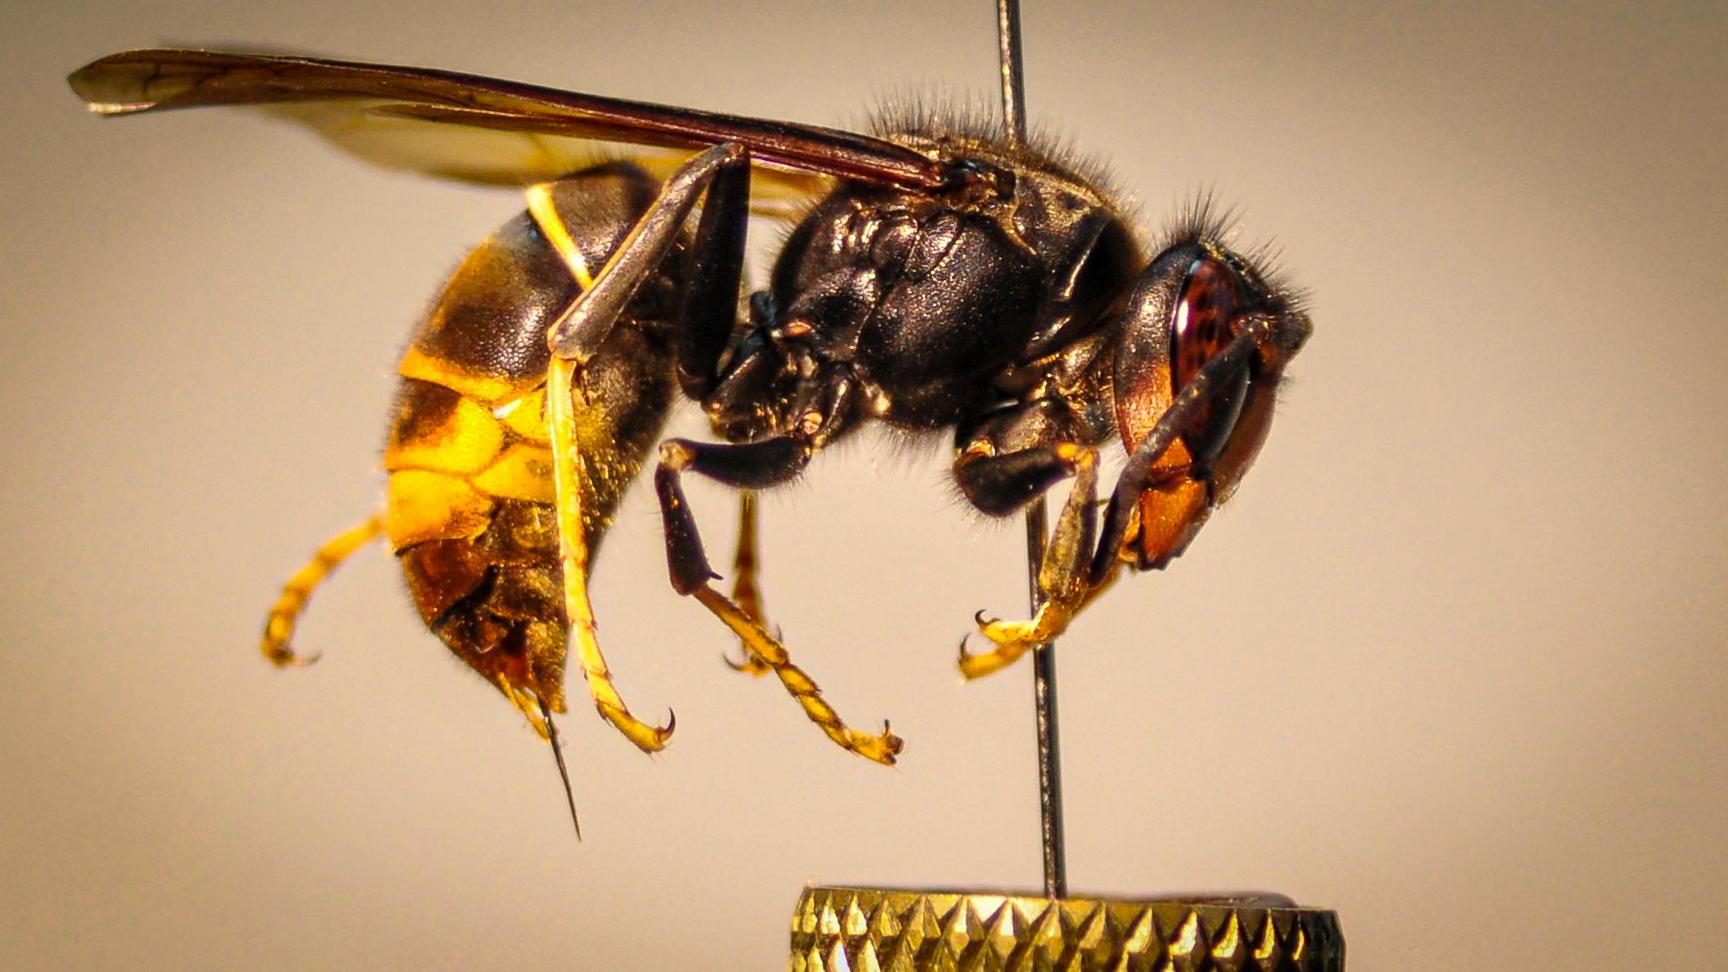 Avispa asiática ('Vespa velutina' ssp. 'Nigrithorax') . Imagen: A. Costa / UIB